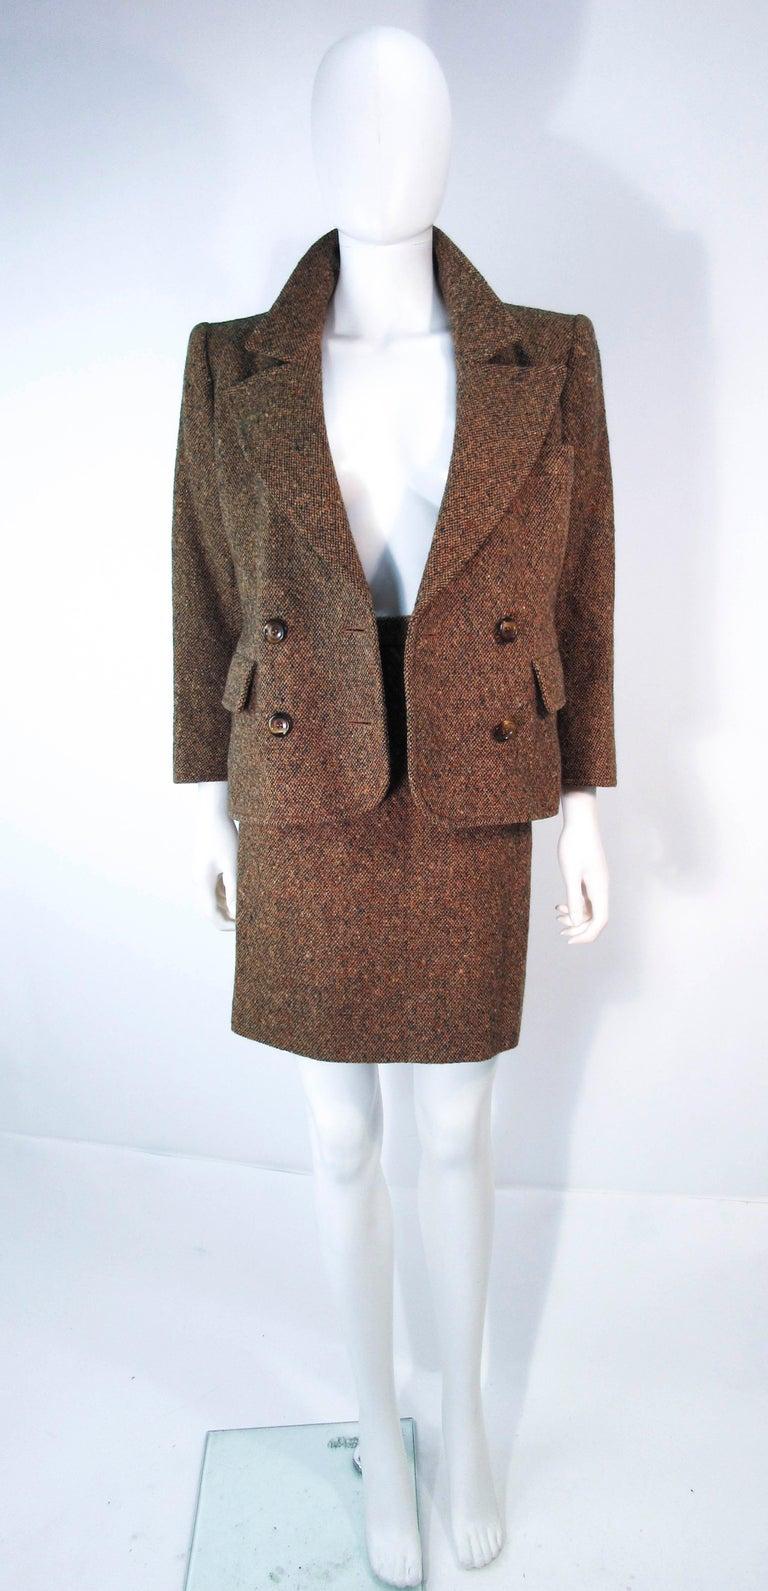 Women's YVES SAINT LAURENT 1970's Brown & Green Skirt Suit Size 4 6 For Sale